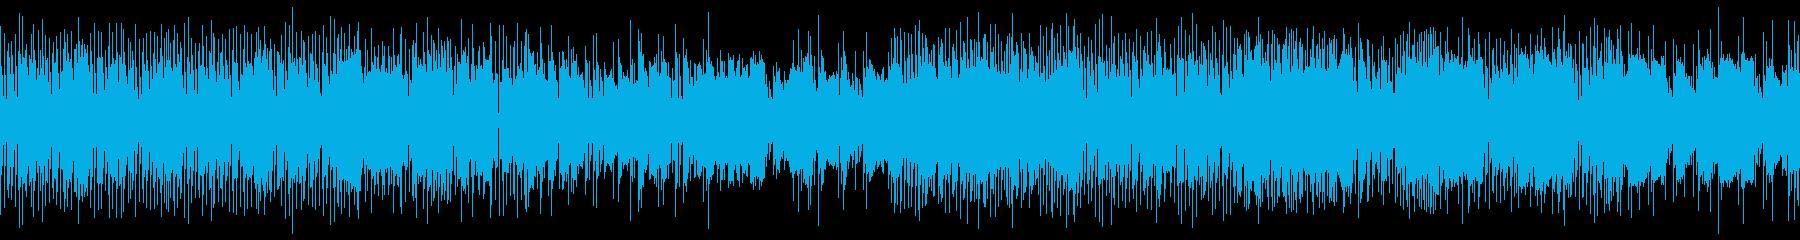 8bitとEベースと生ドラムのゲーム風曲の再生済みの波形